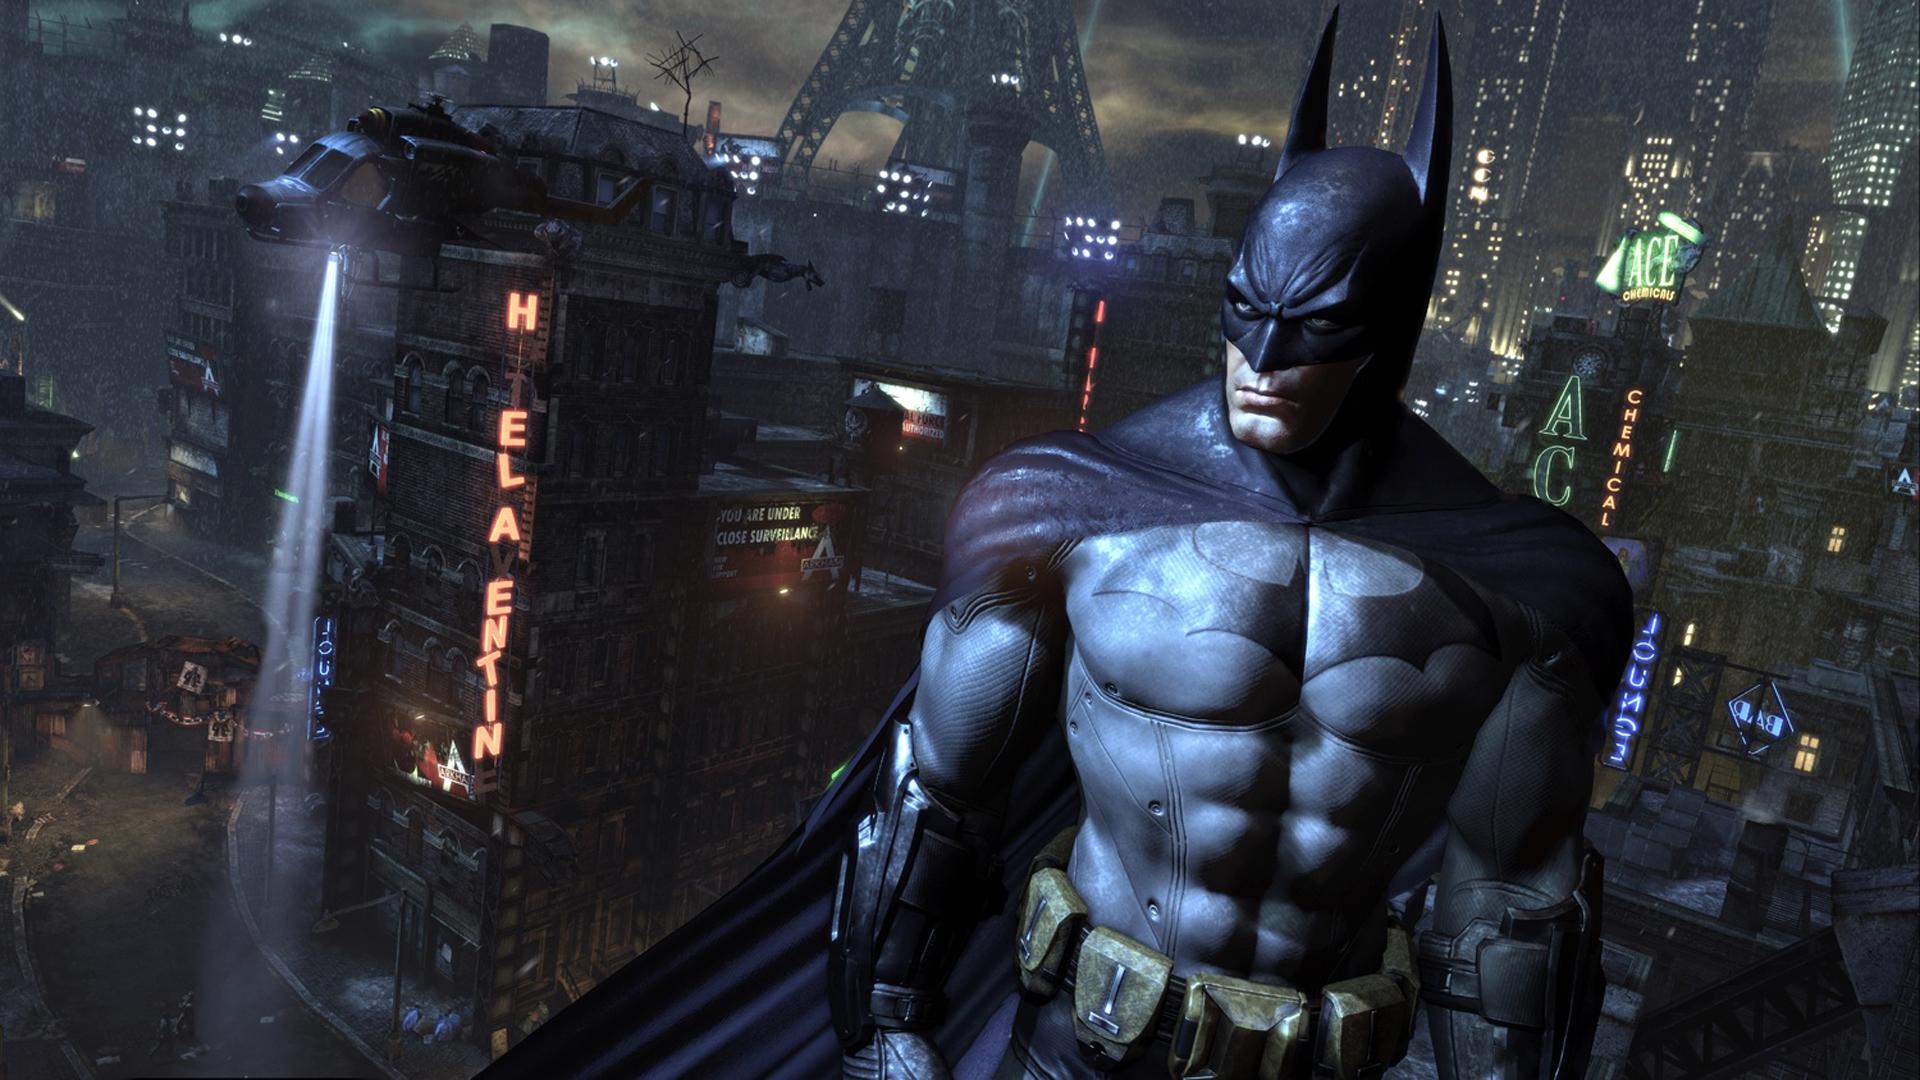 Batman Arkham City HD Wallpapers   HQ Wallpapers   HQ Wallpapers 1920x1080